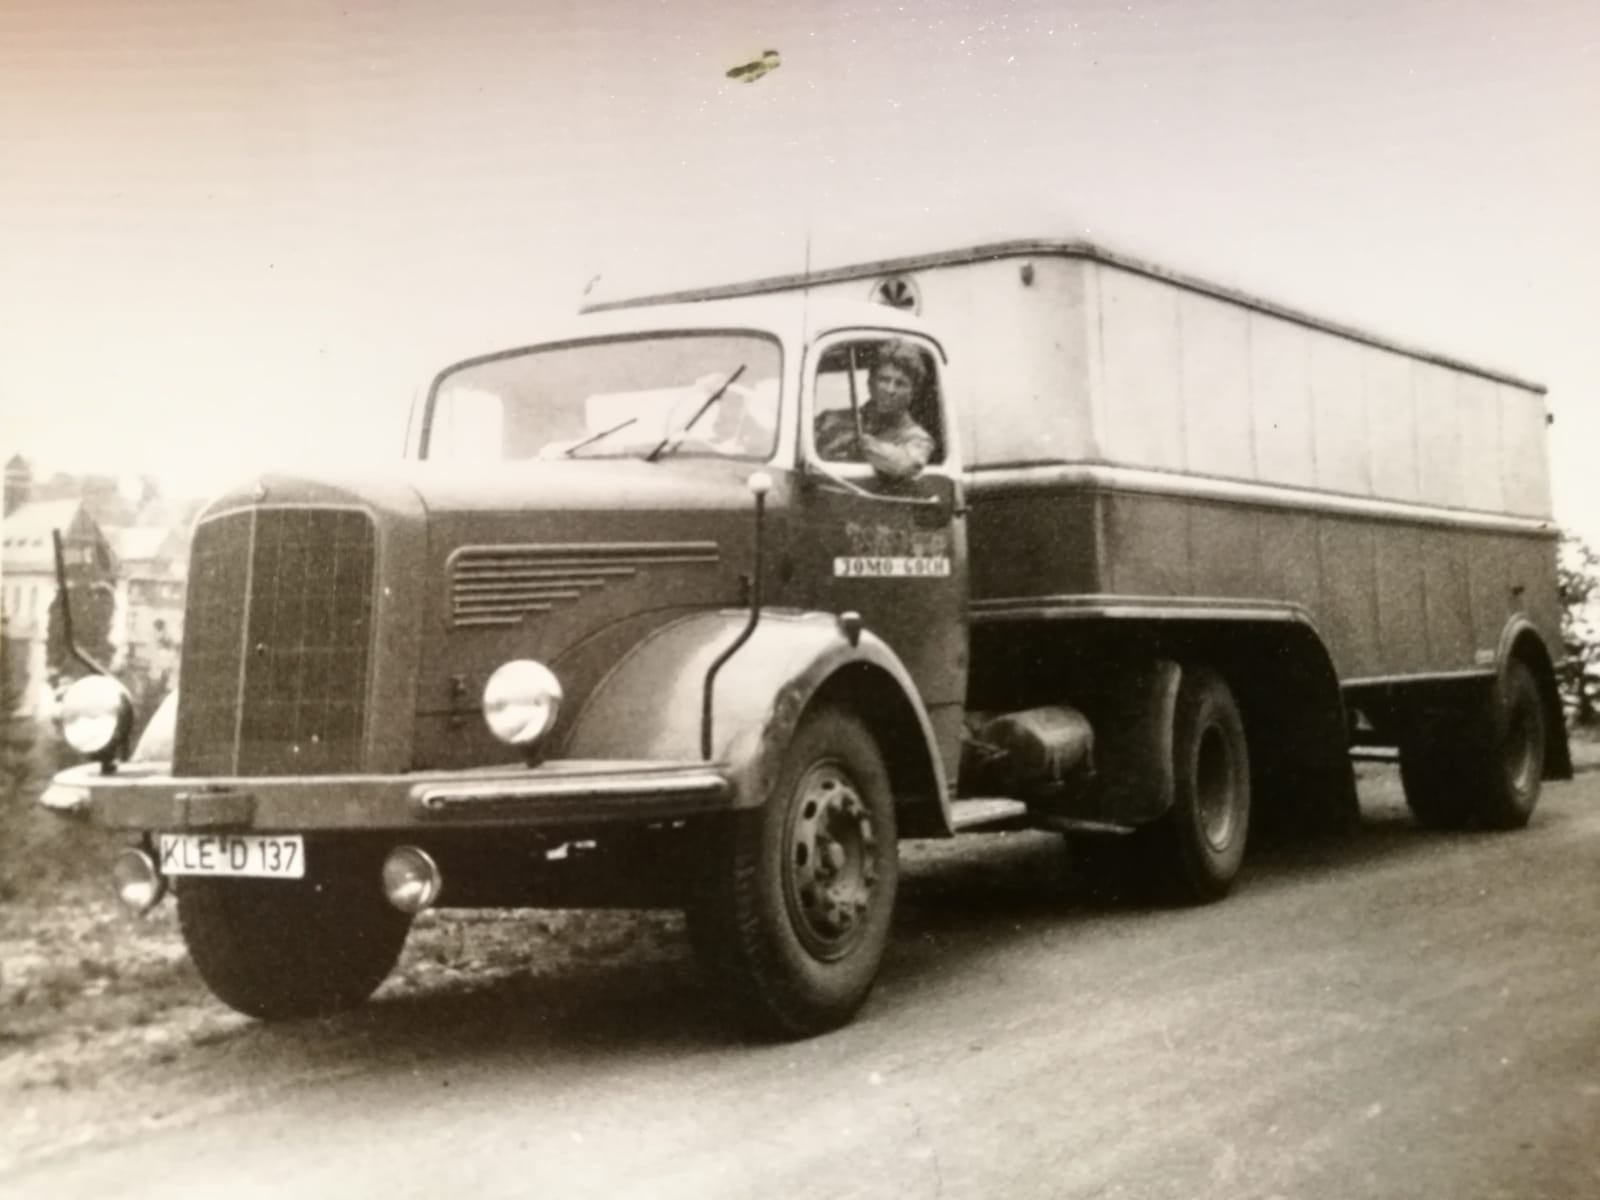 MB-L325